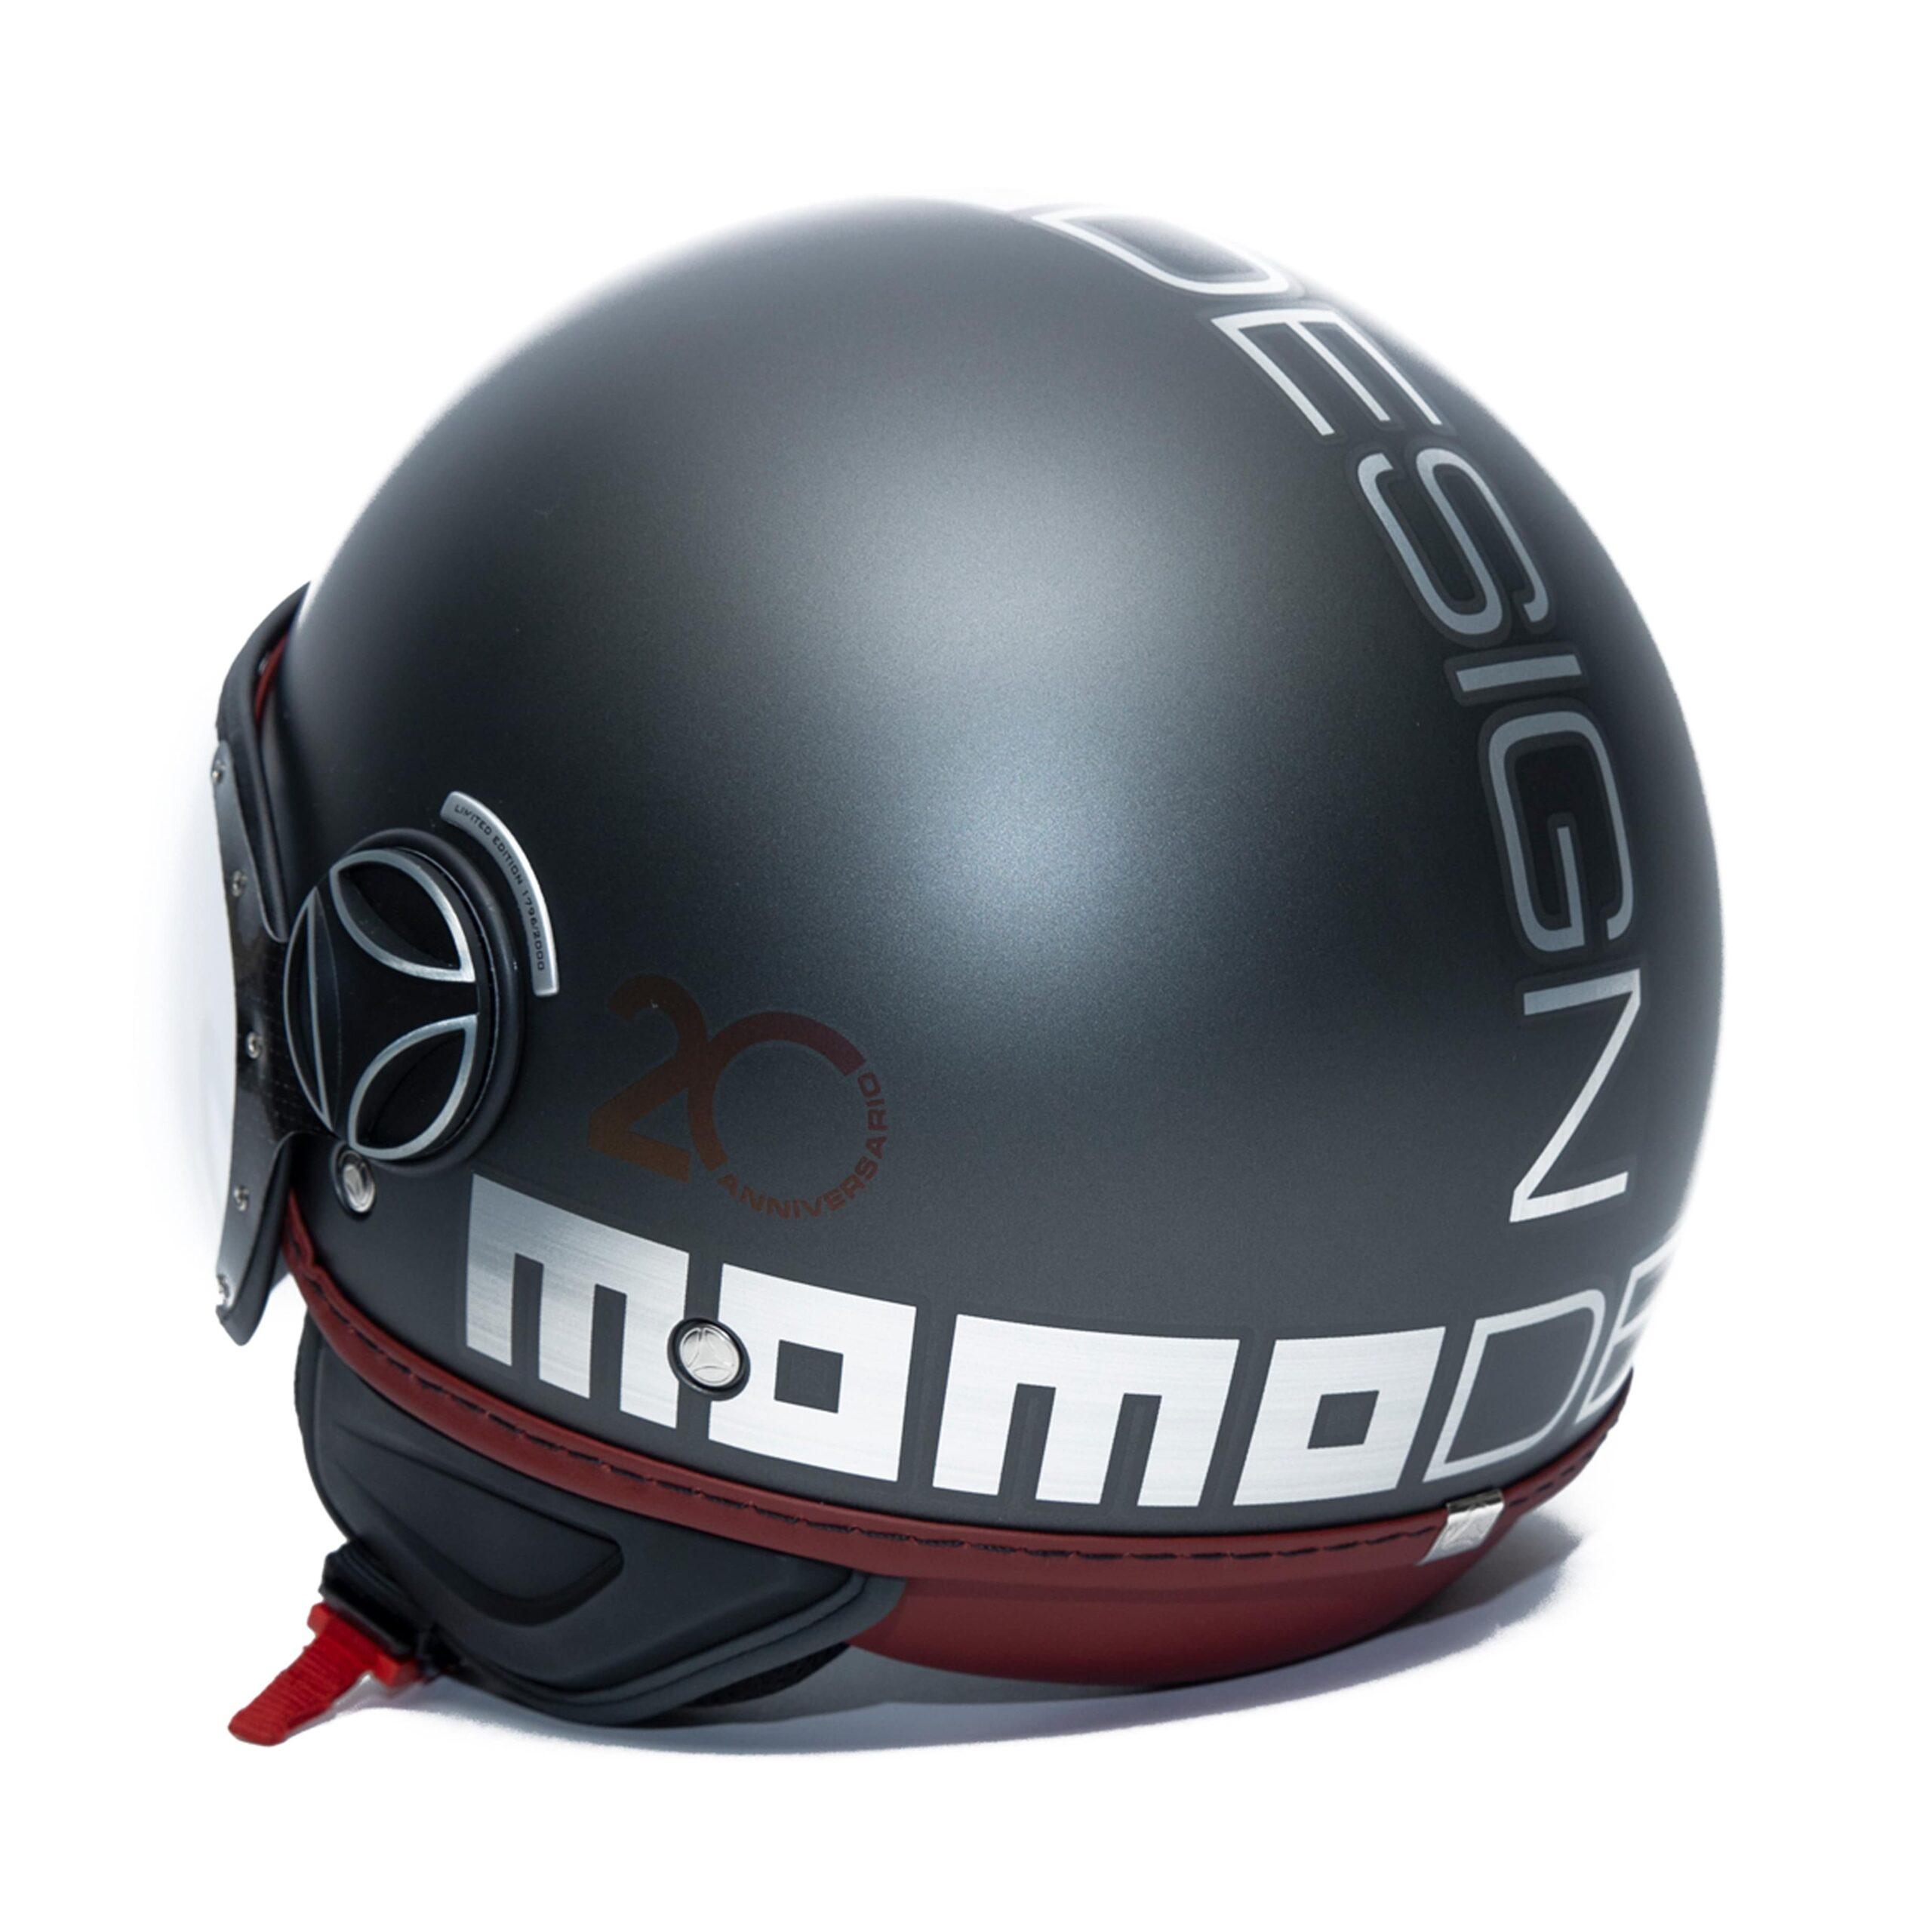 MOMO FGTR 02